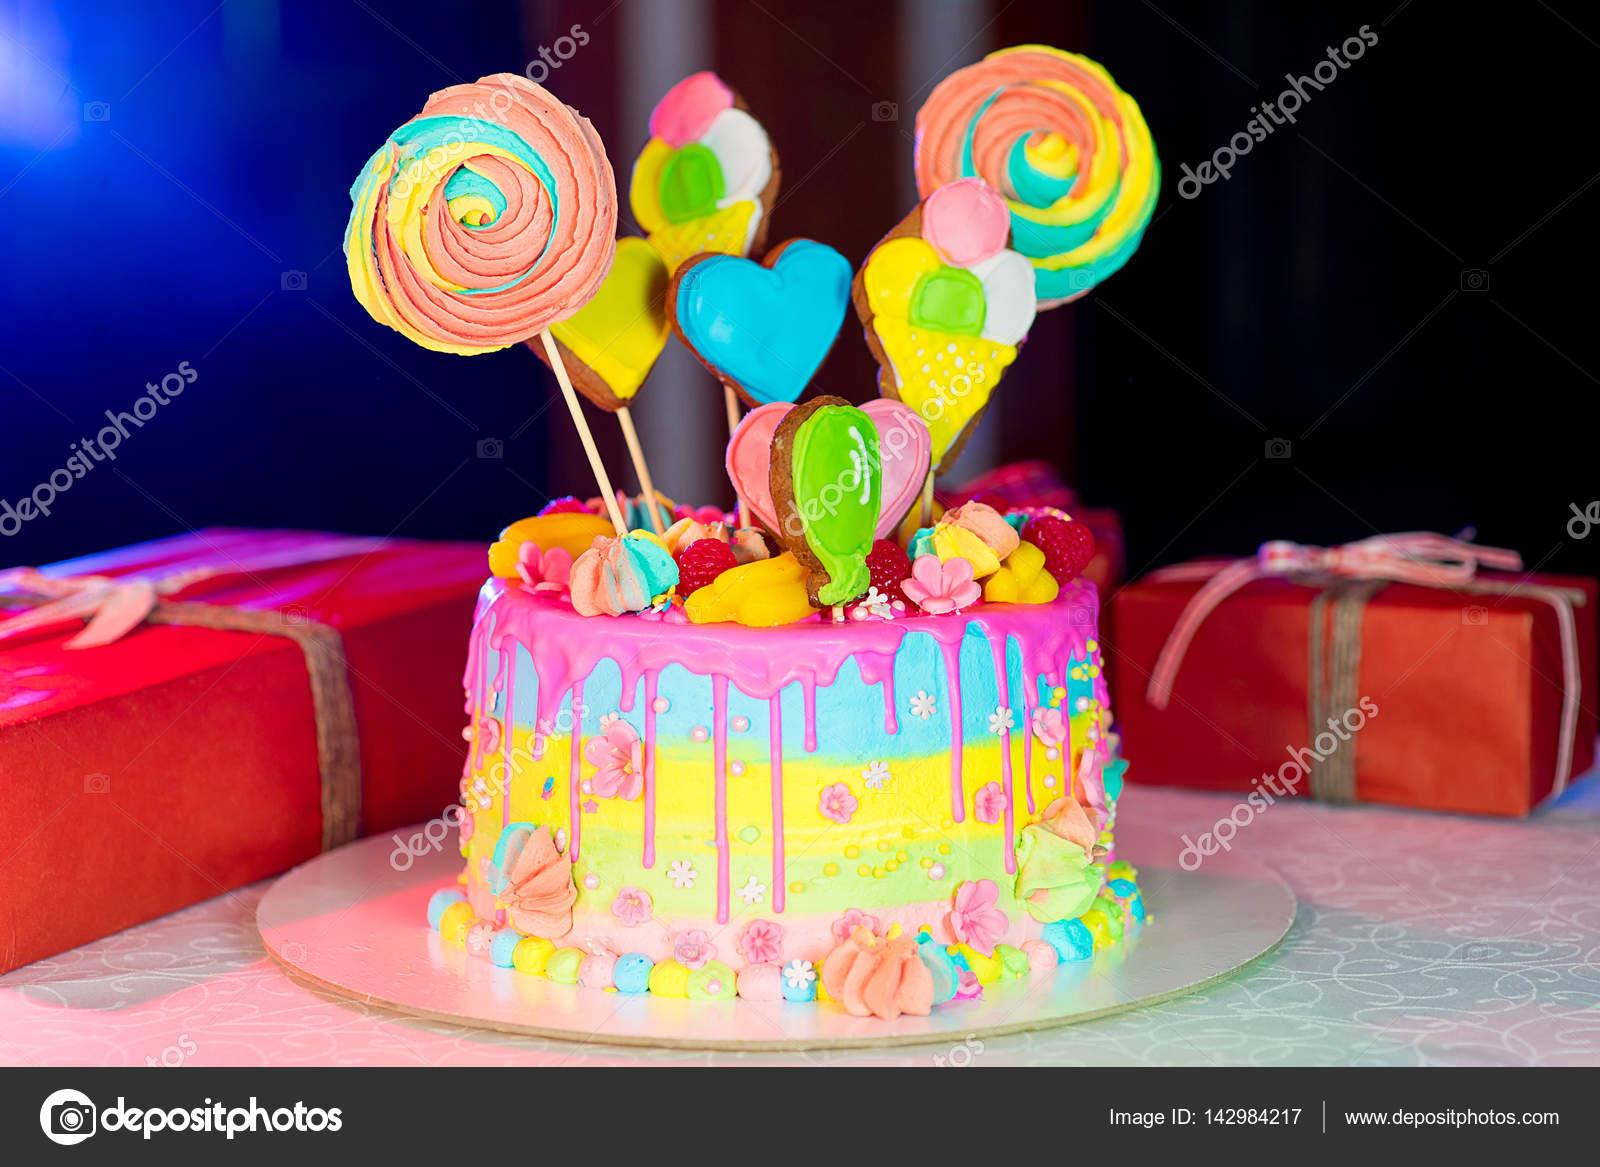 Swell Large Birthday Cake On The Table Stock Photo C Lenanichizhenova Funny Birthday Cards Online Sheoxdamsfinfo